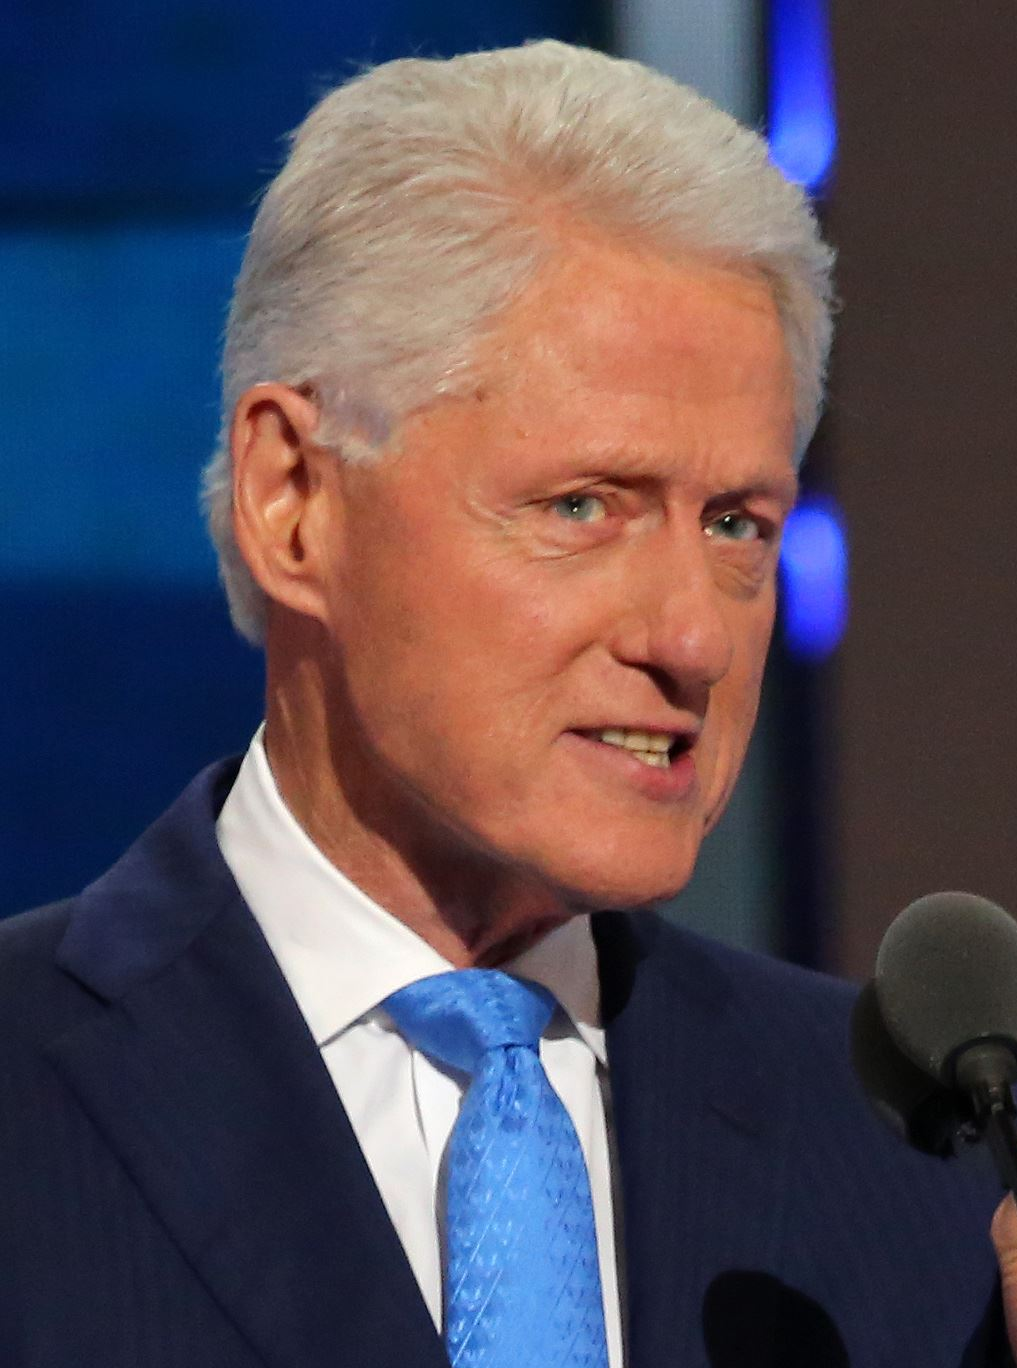 FileBill Clinton DNC July Croppedjpg Wikimedia Commons - Wikipedia bill clinton